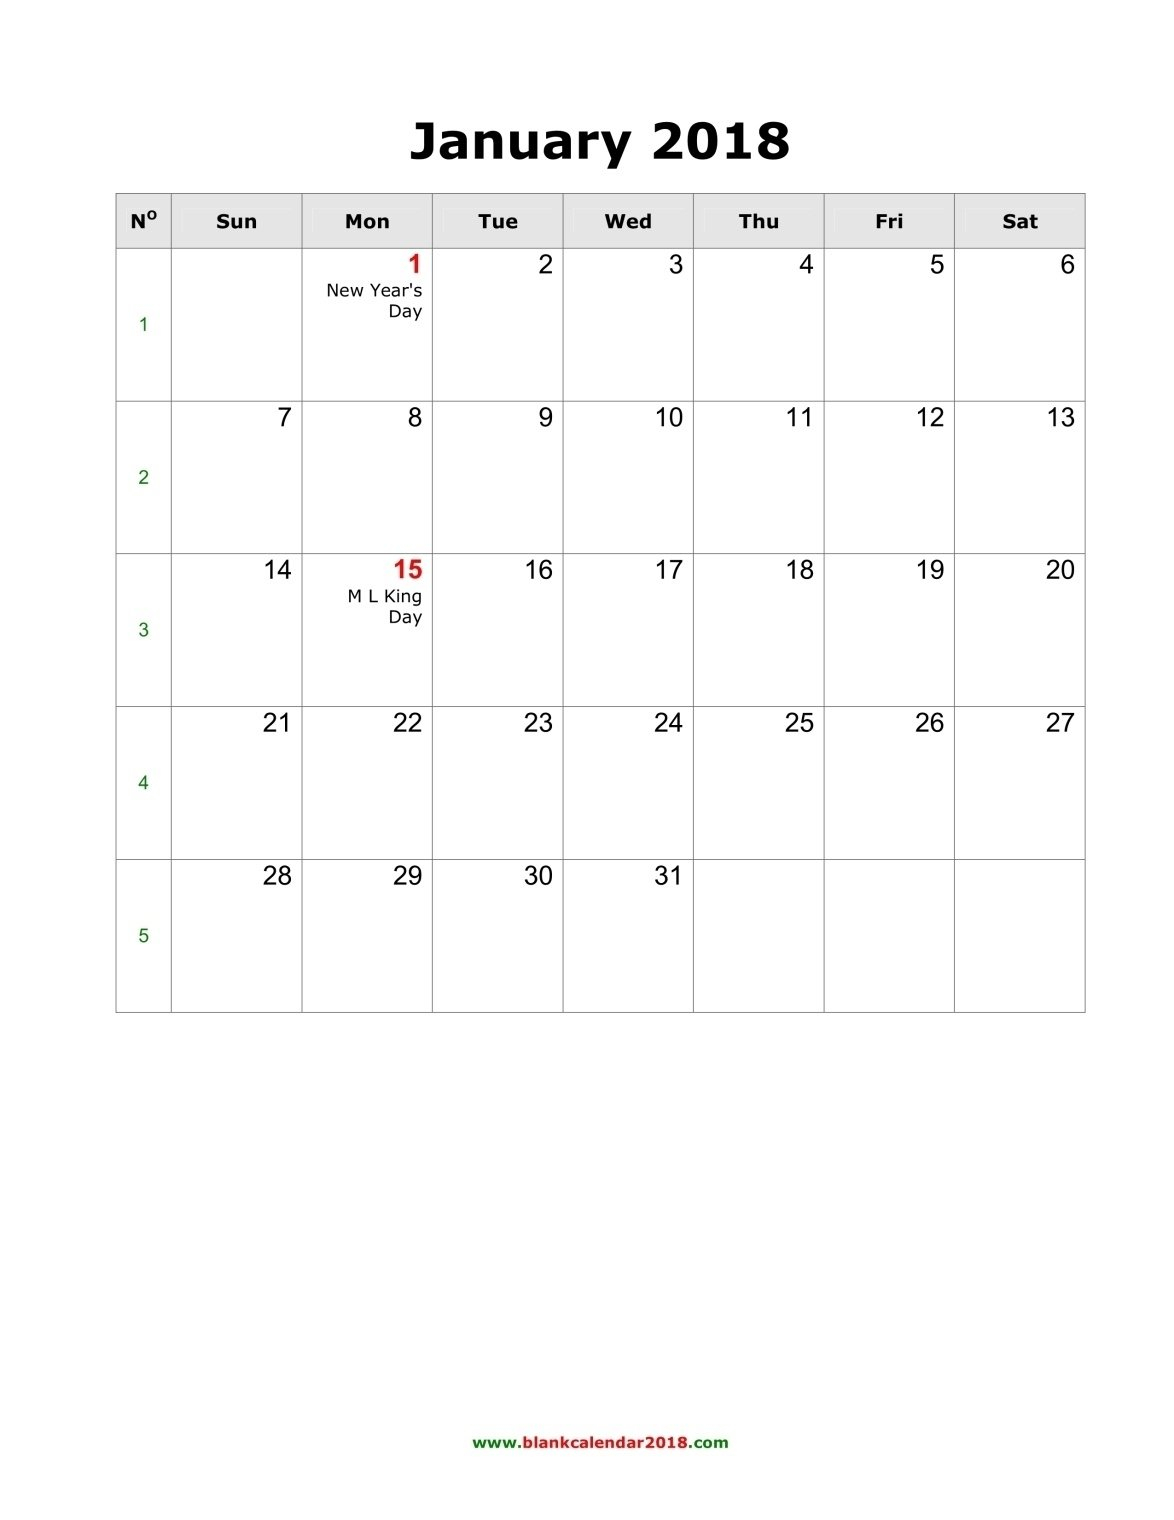 2018 Blank Printable Calendars – Template Calendar Design Calendars To Fill In And Print